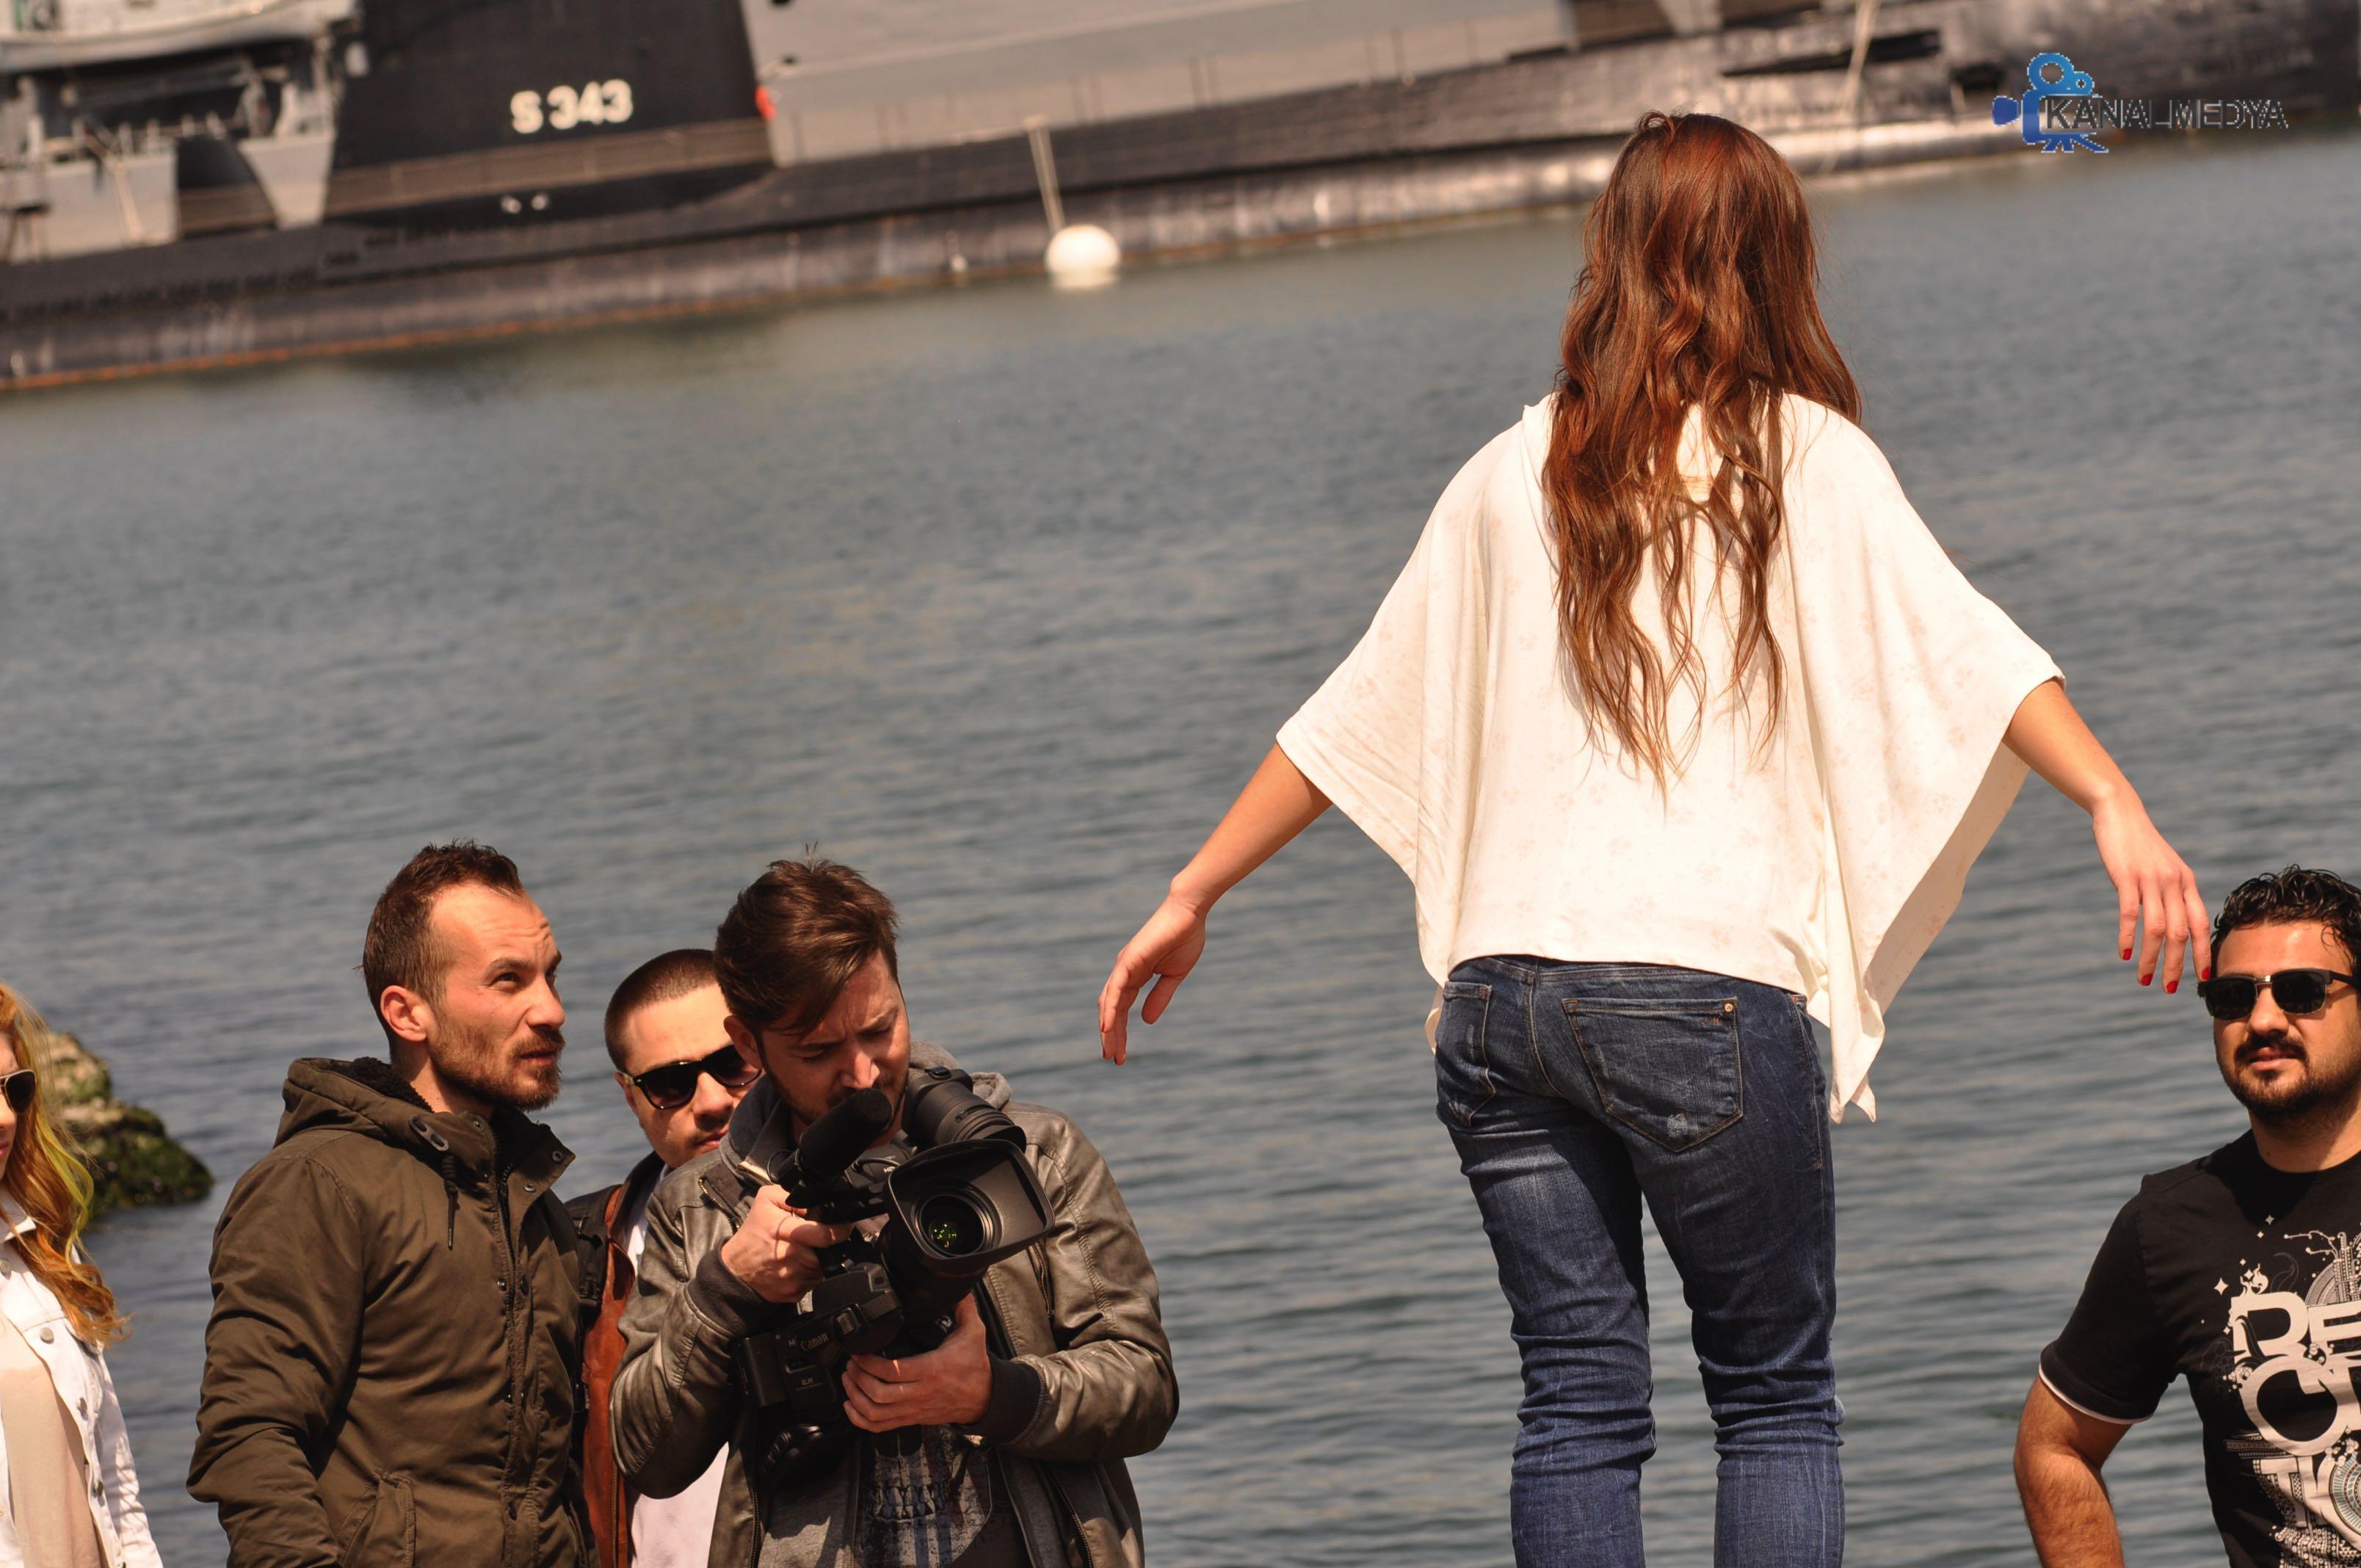 Kanal-Medya_044.jpg